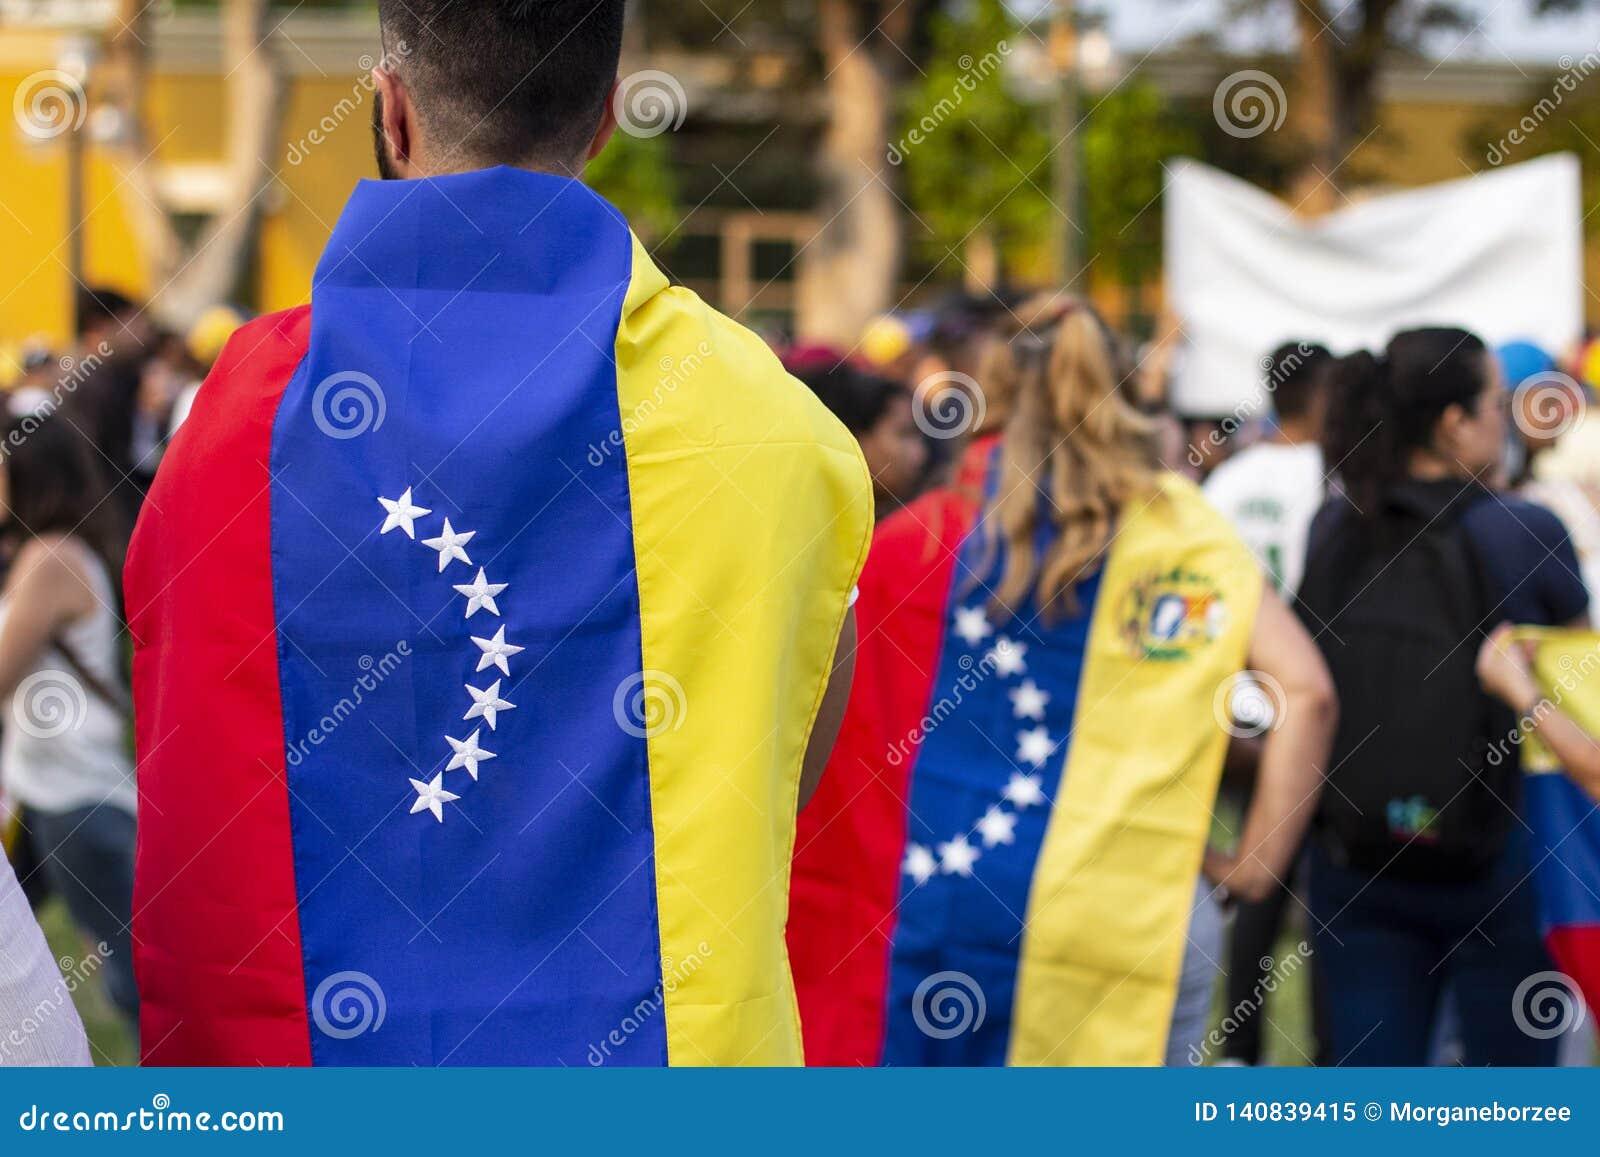 La gente avvolta in bandiere venezuelane alla protesta